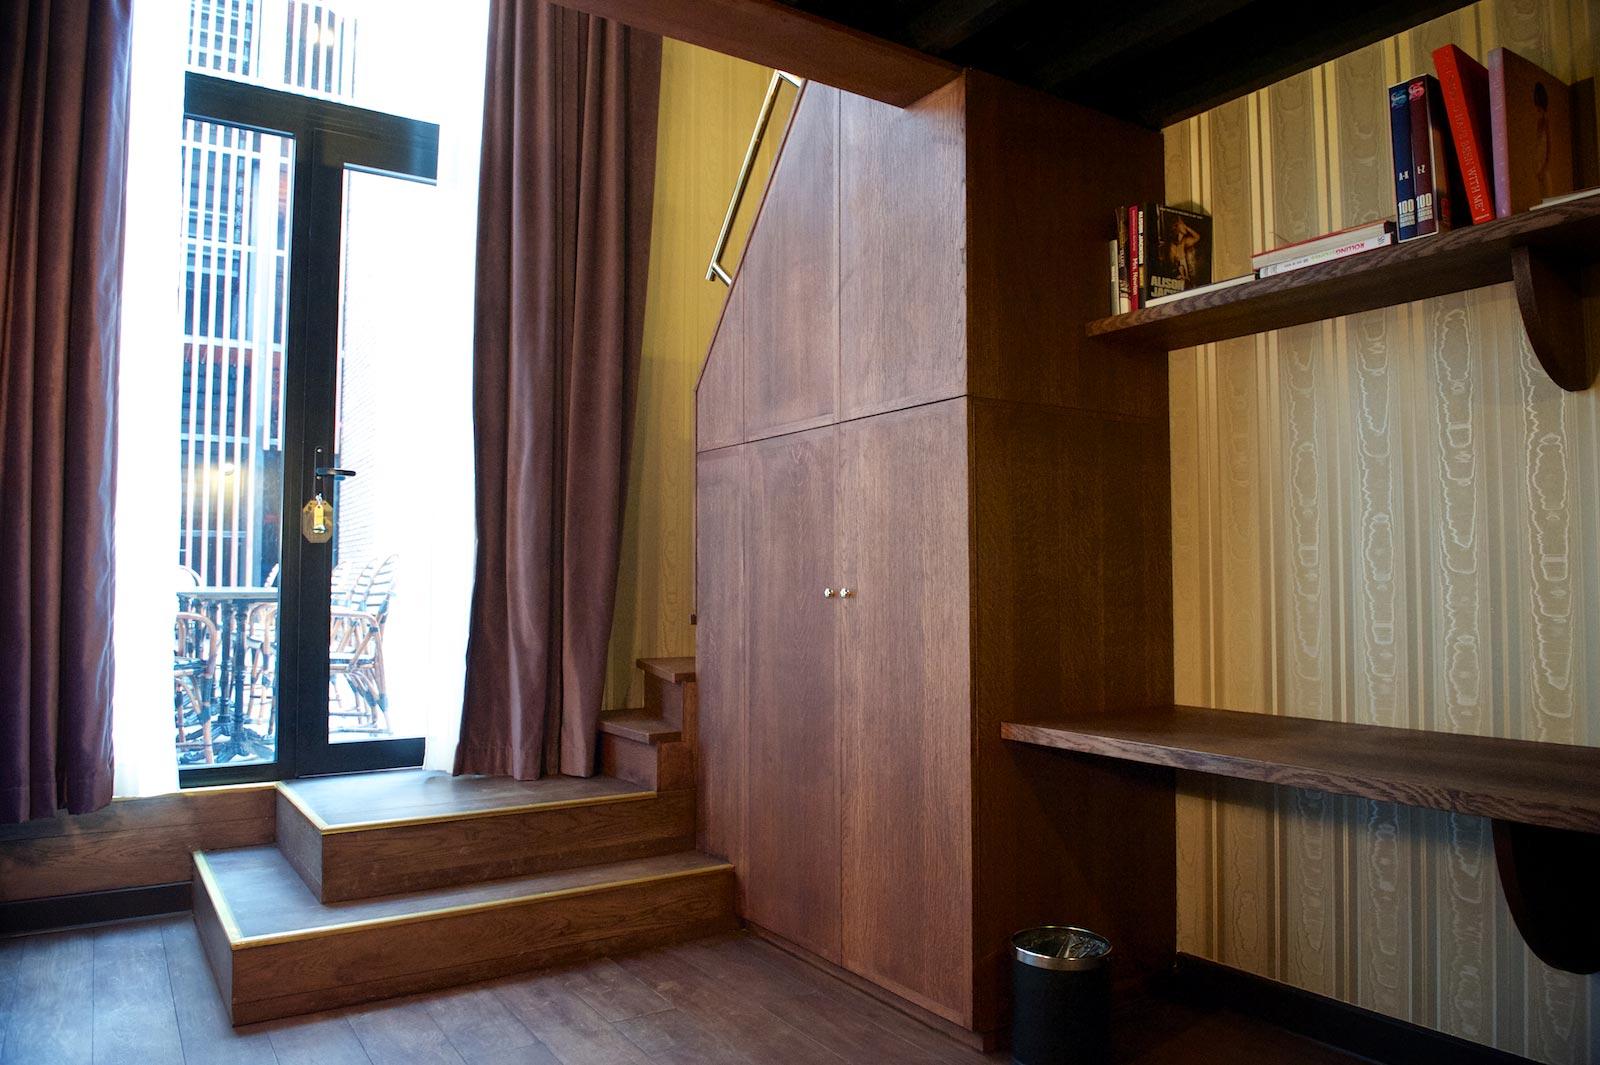 hotel-le-berger-rooms-comfort-mezzanine-eulalie-003-02.jpg